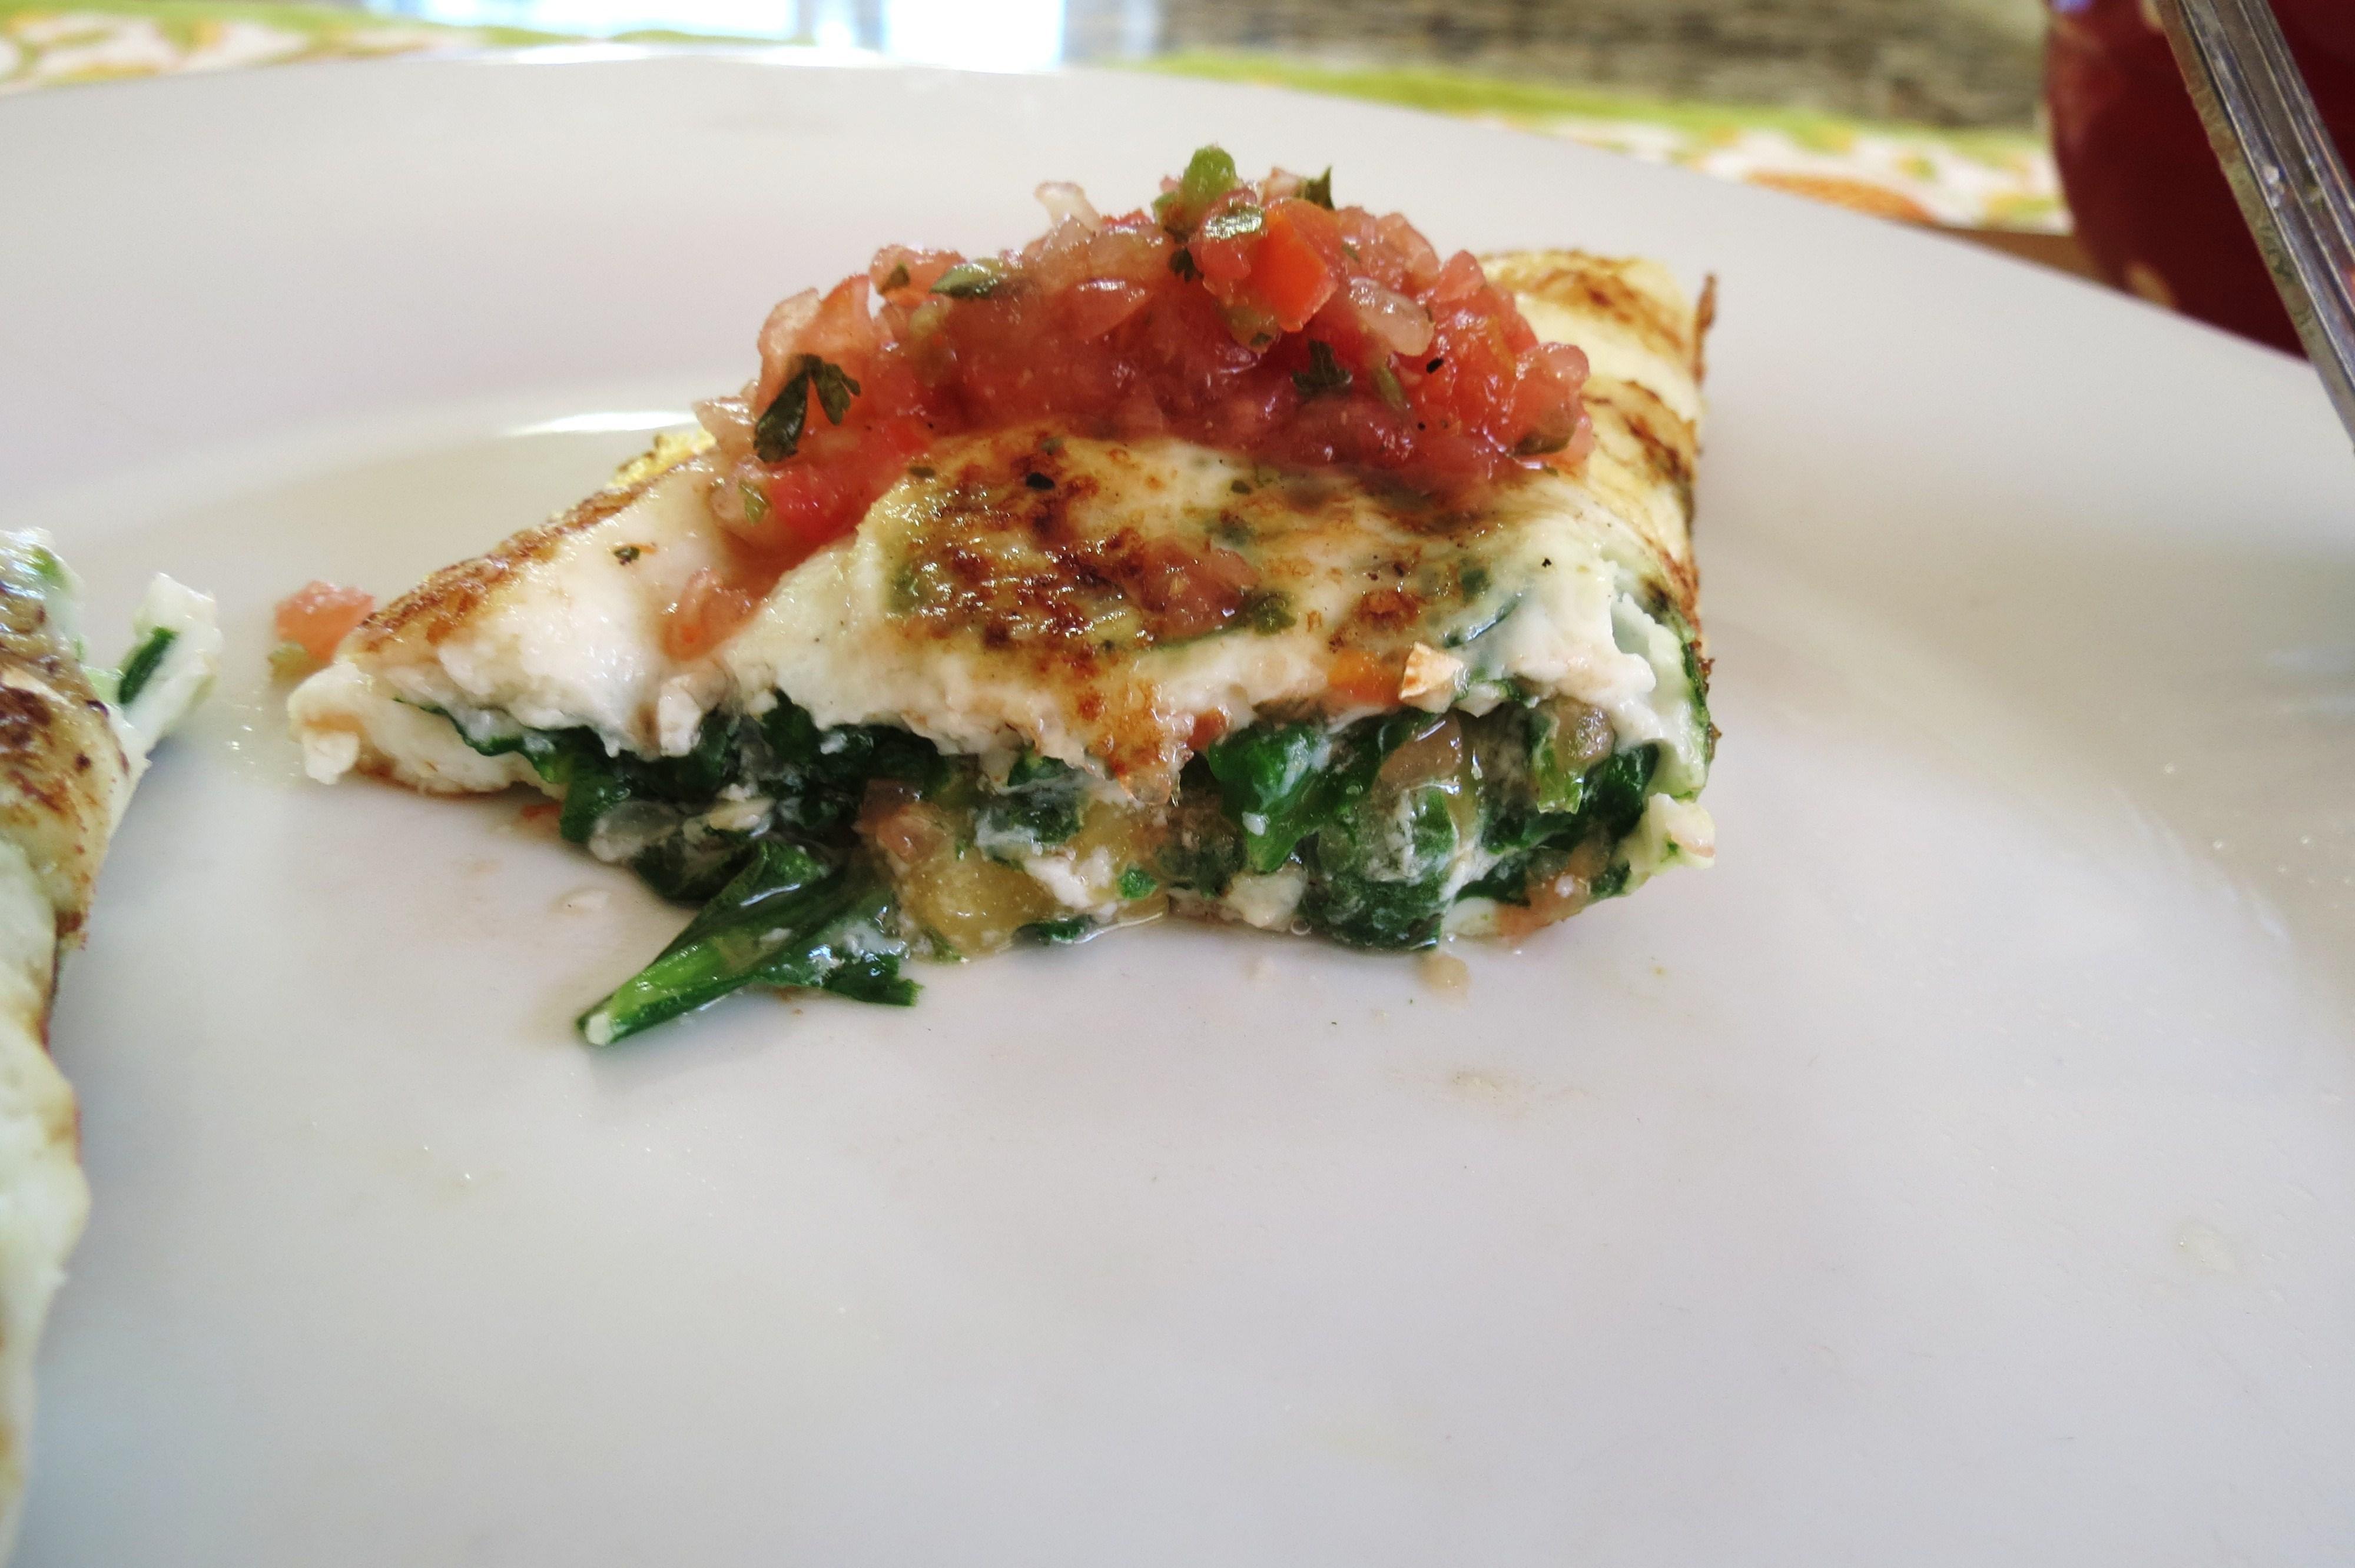 how to make a 3 egg omelette